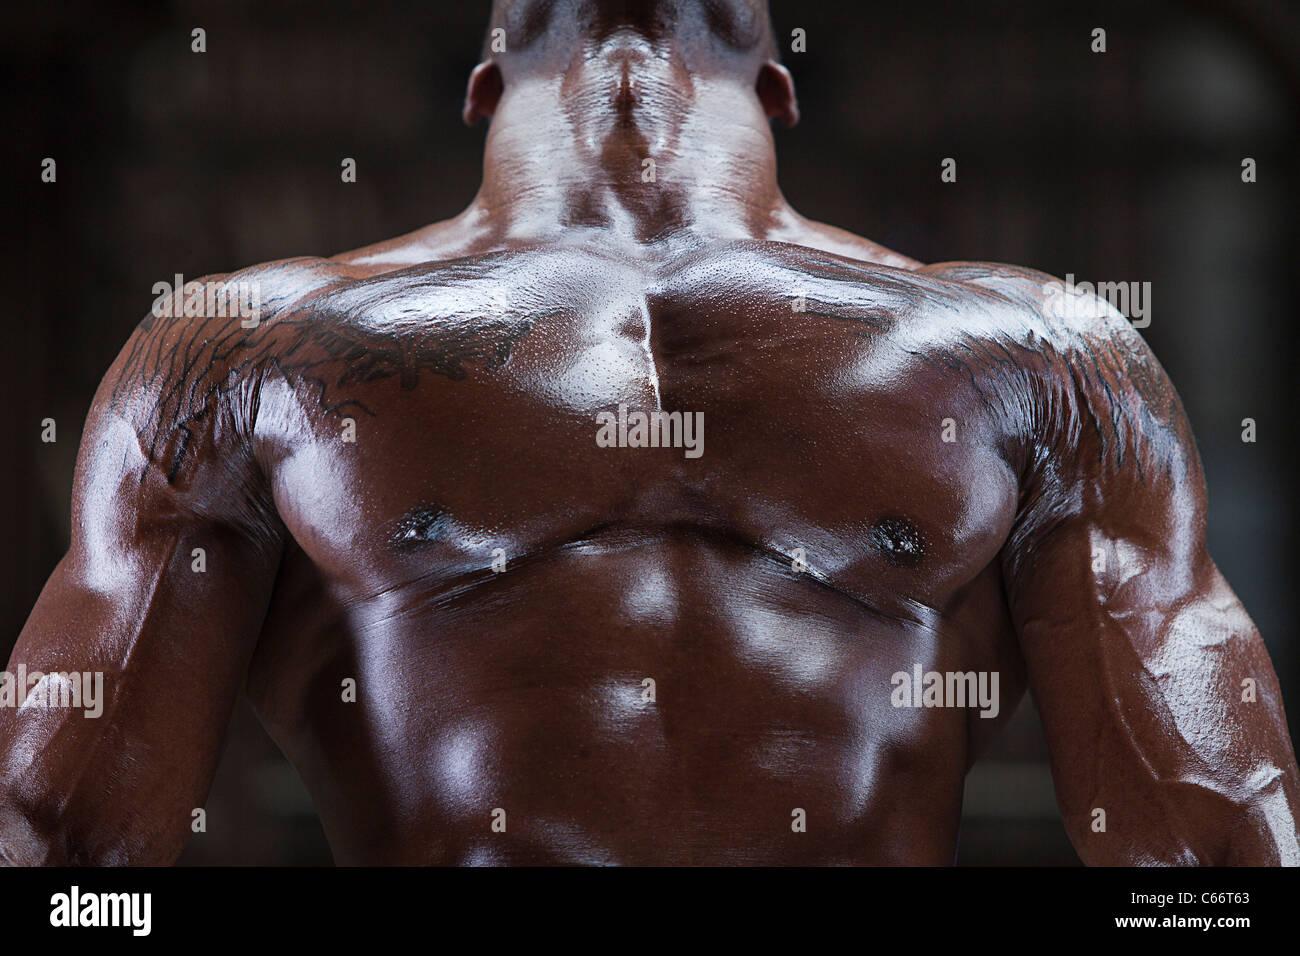 Nahaufnahme eines Sportlers muskulösen Brust Stockfoto